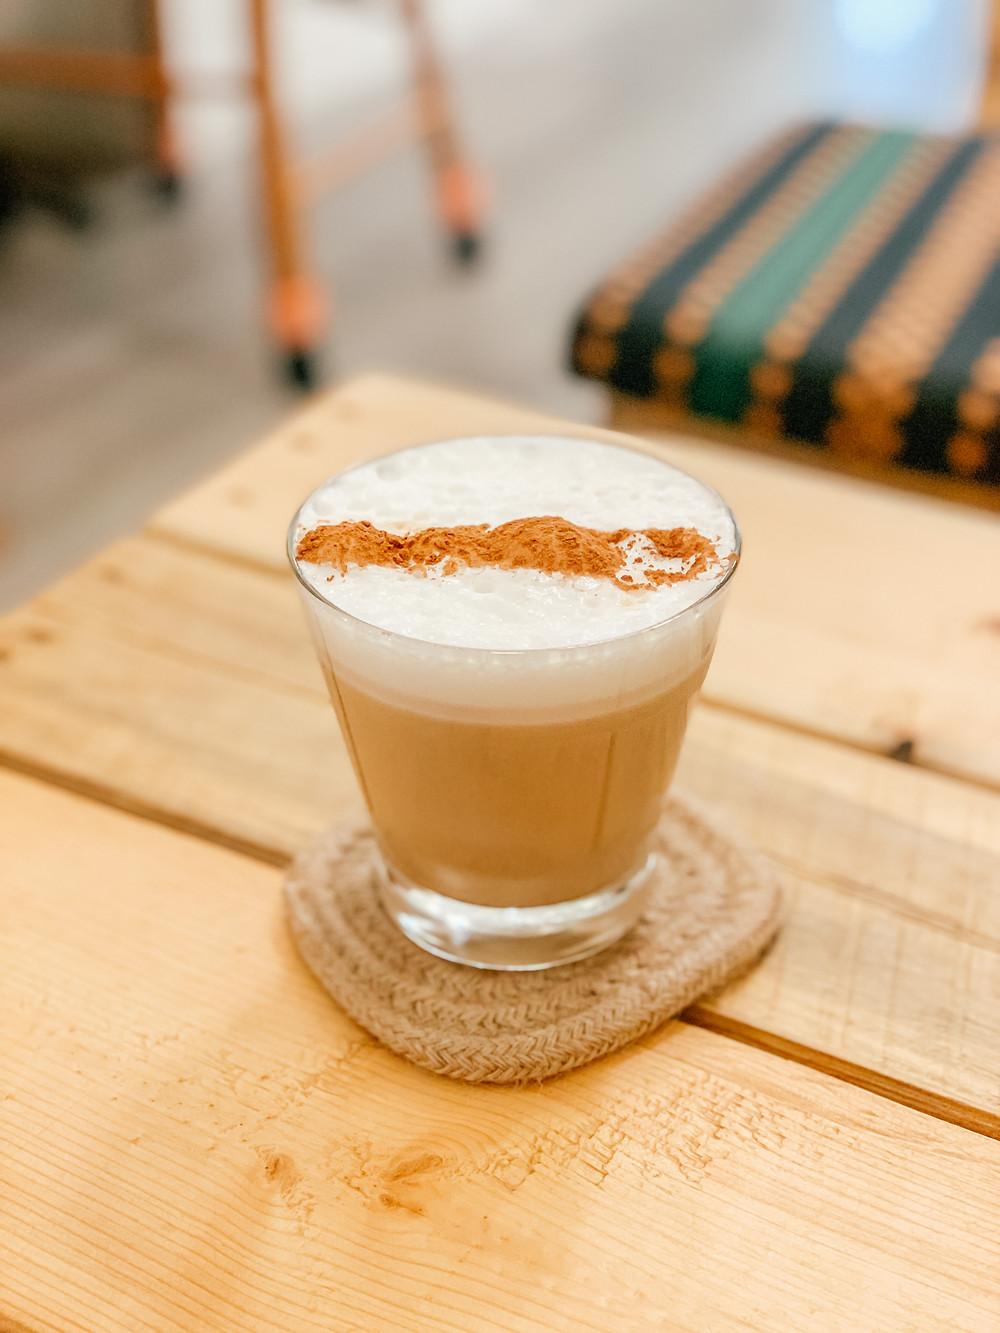 月半 Dwaco 咖啡 Coffee | Taipei Cafe | A Style Alike